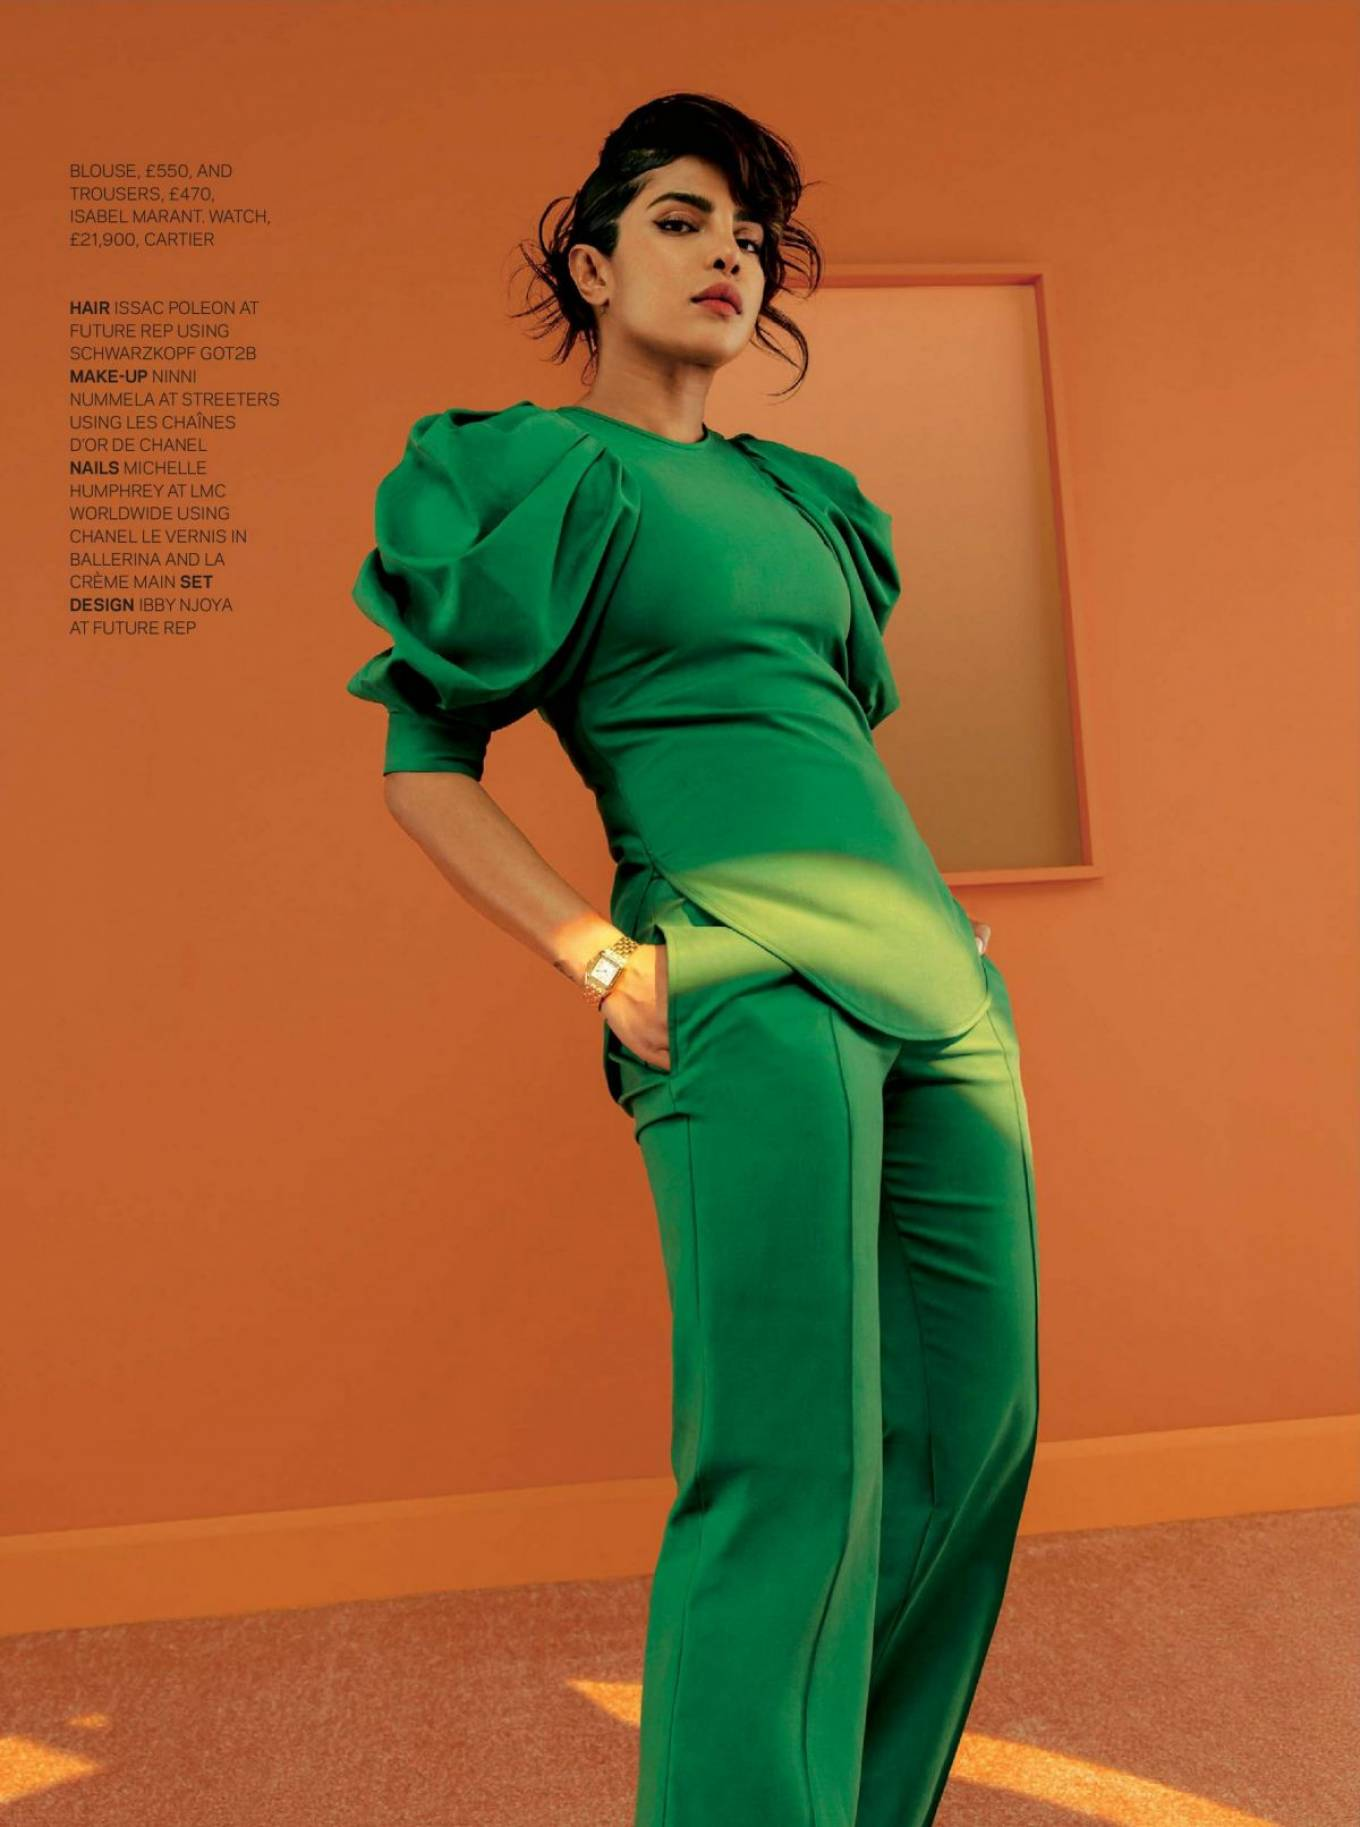 Priyanka Chopra - The Sunday Times Style Magazine (January 2021)